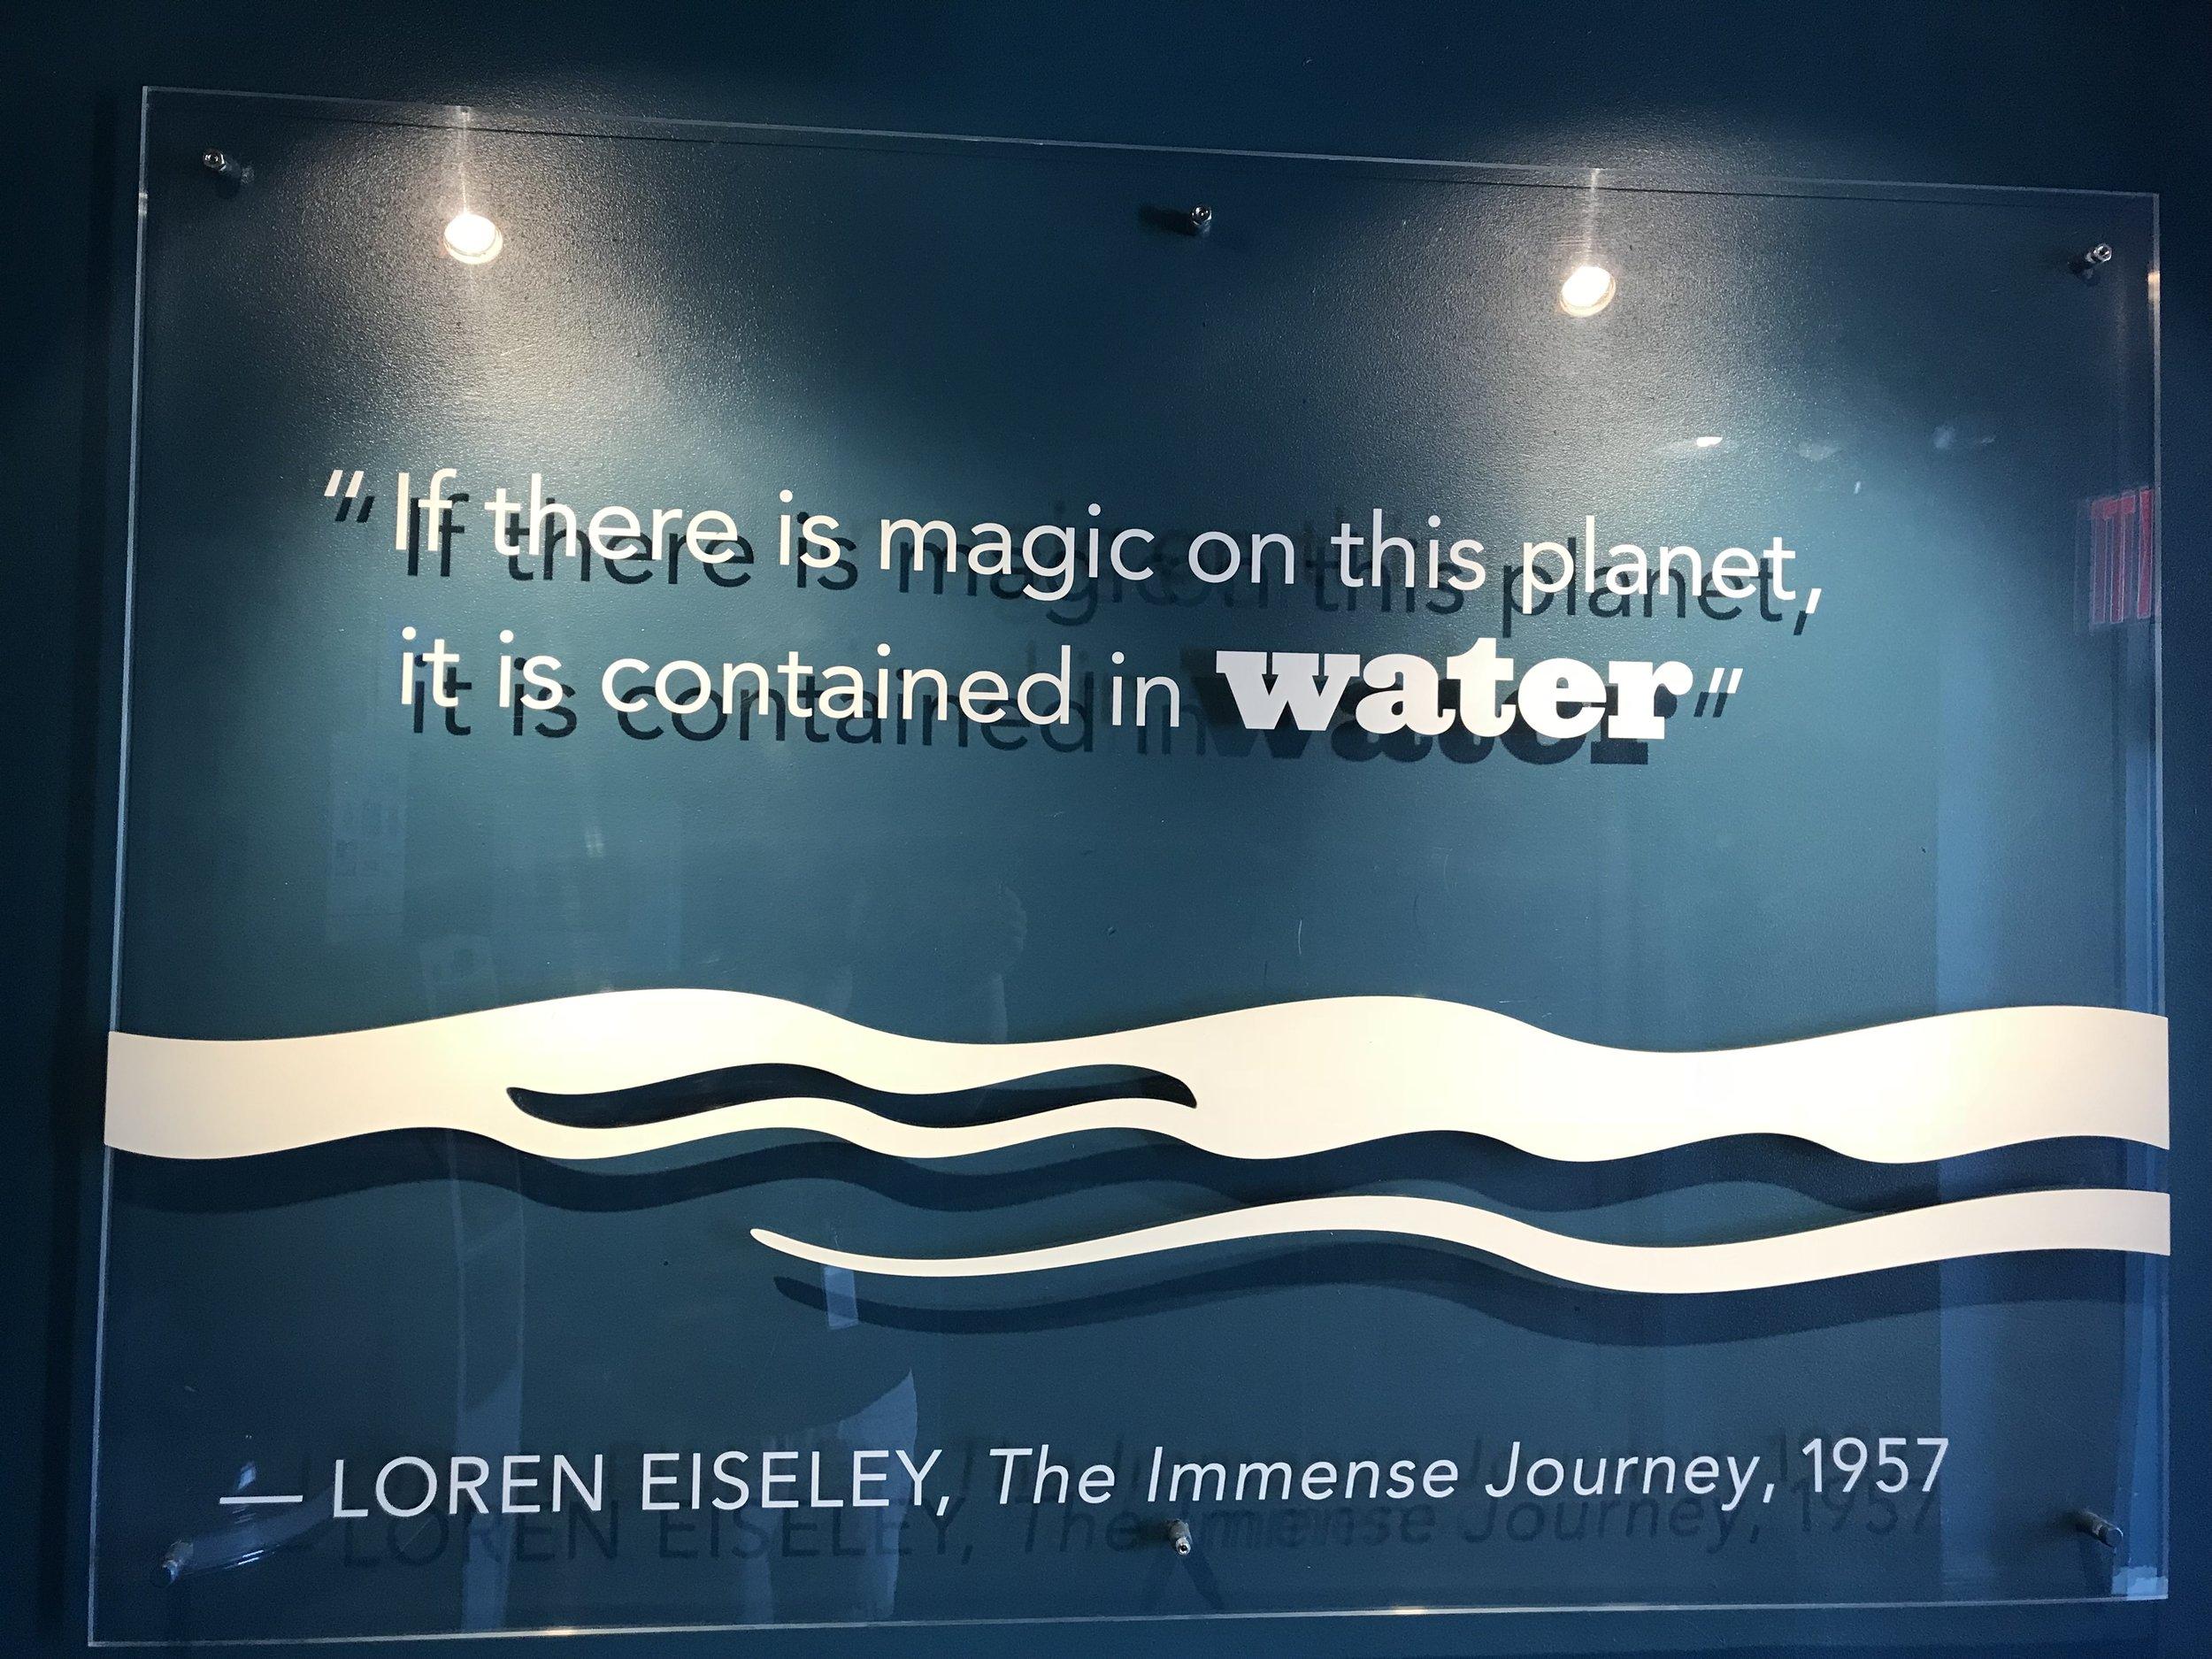 Magic... Water